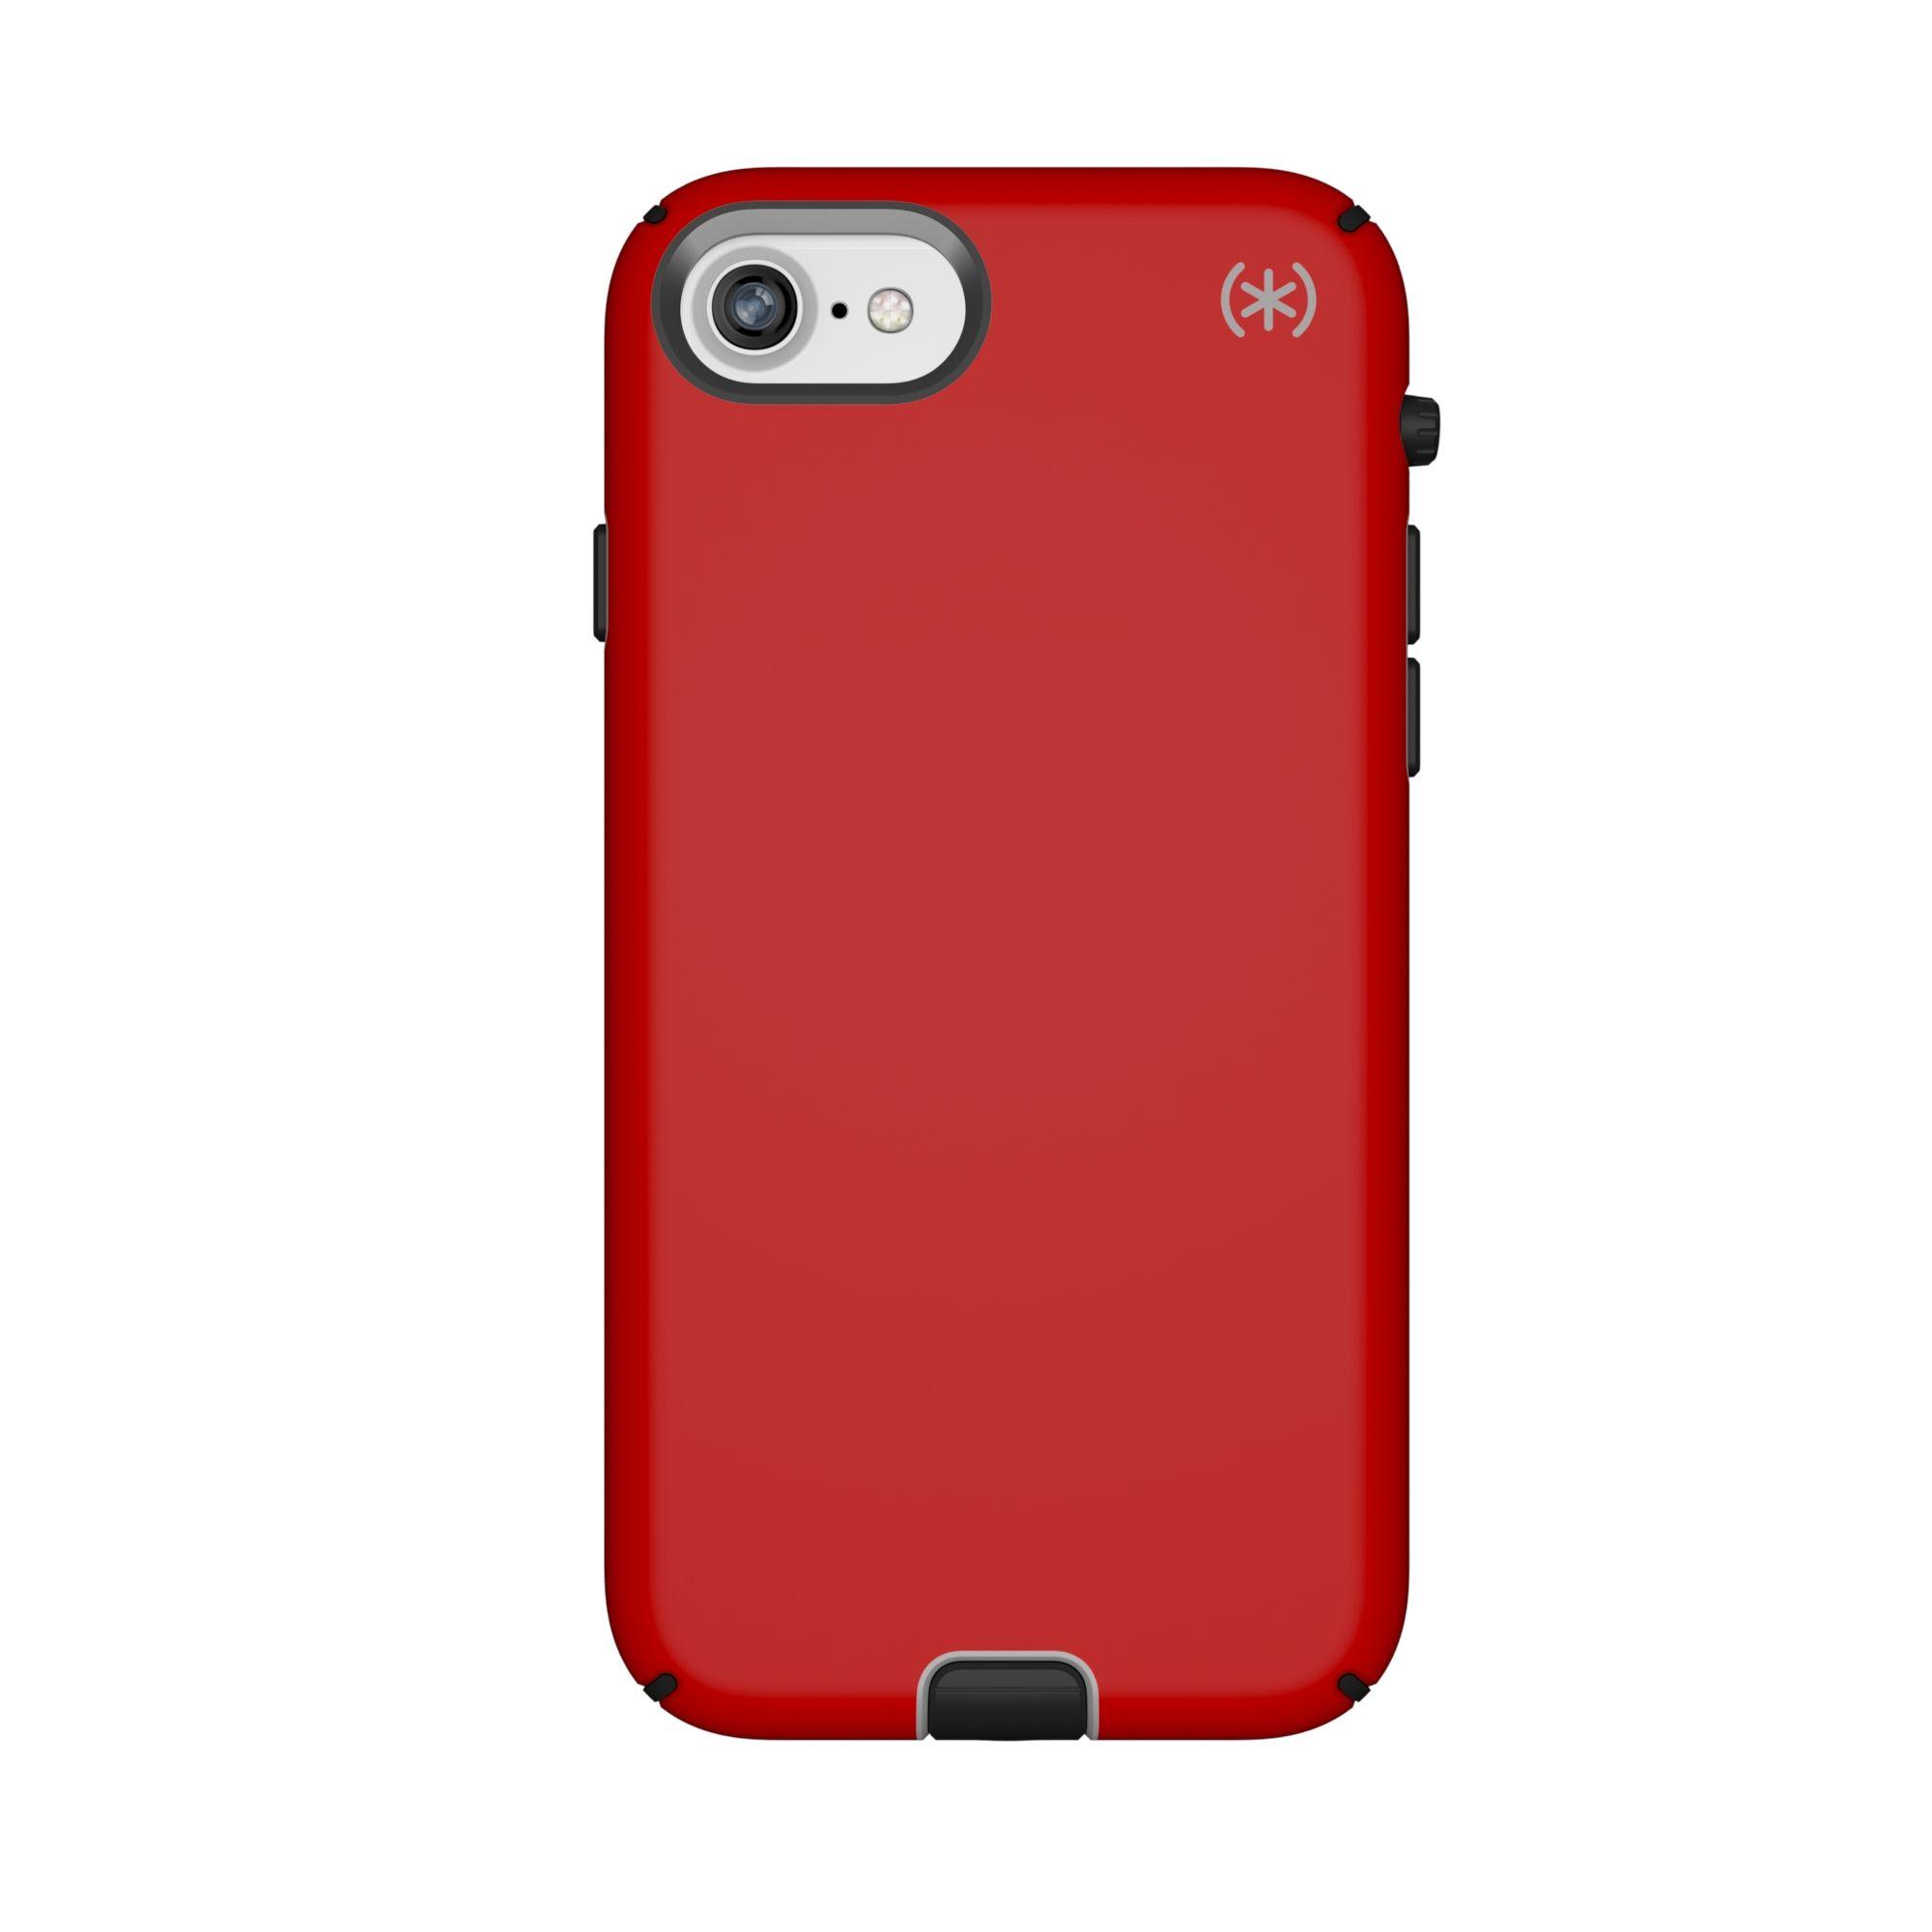 Калъф Speck Iphone 8/7 Presidio Sport - Heartrate Red/Sidewalk Grey/Black - 1